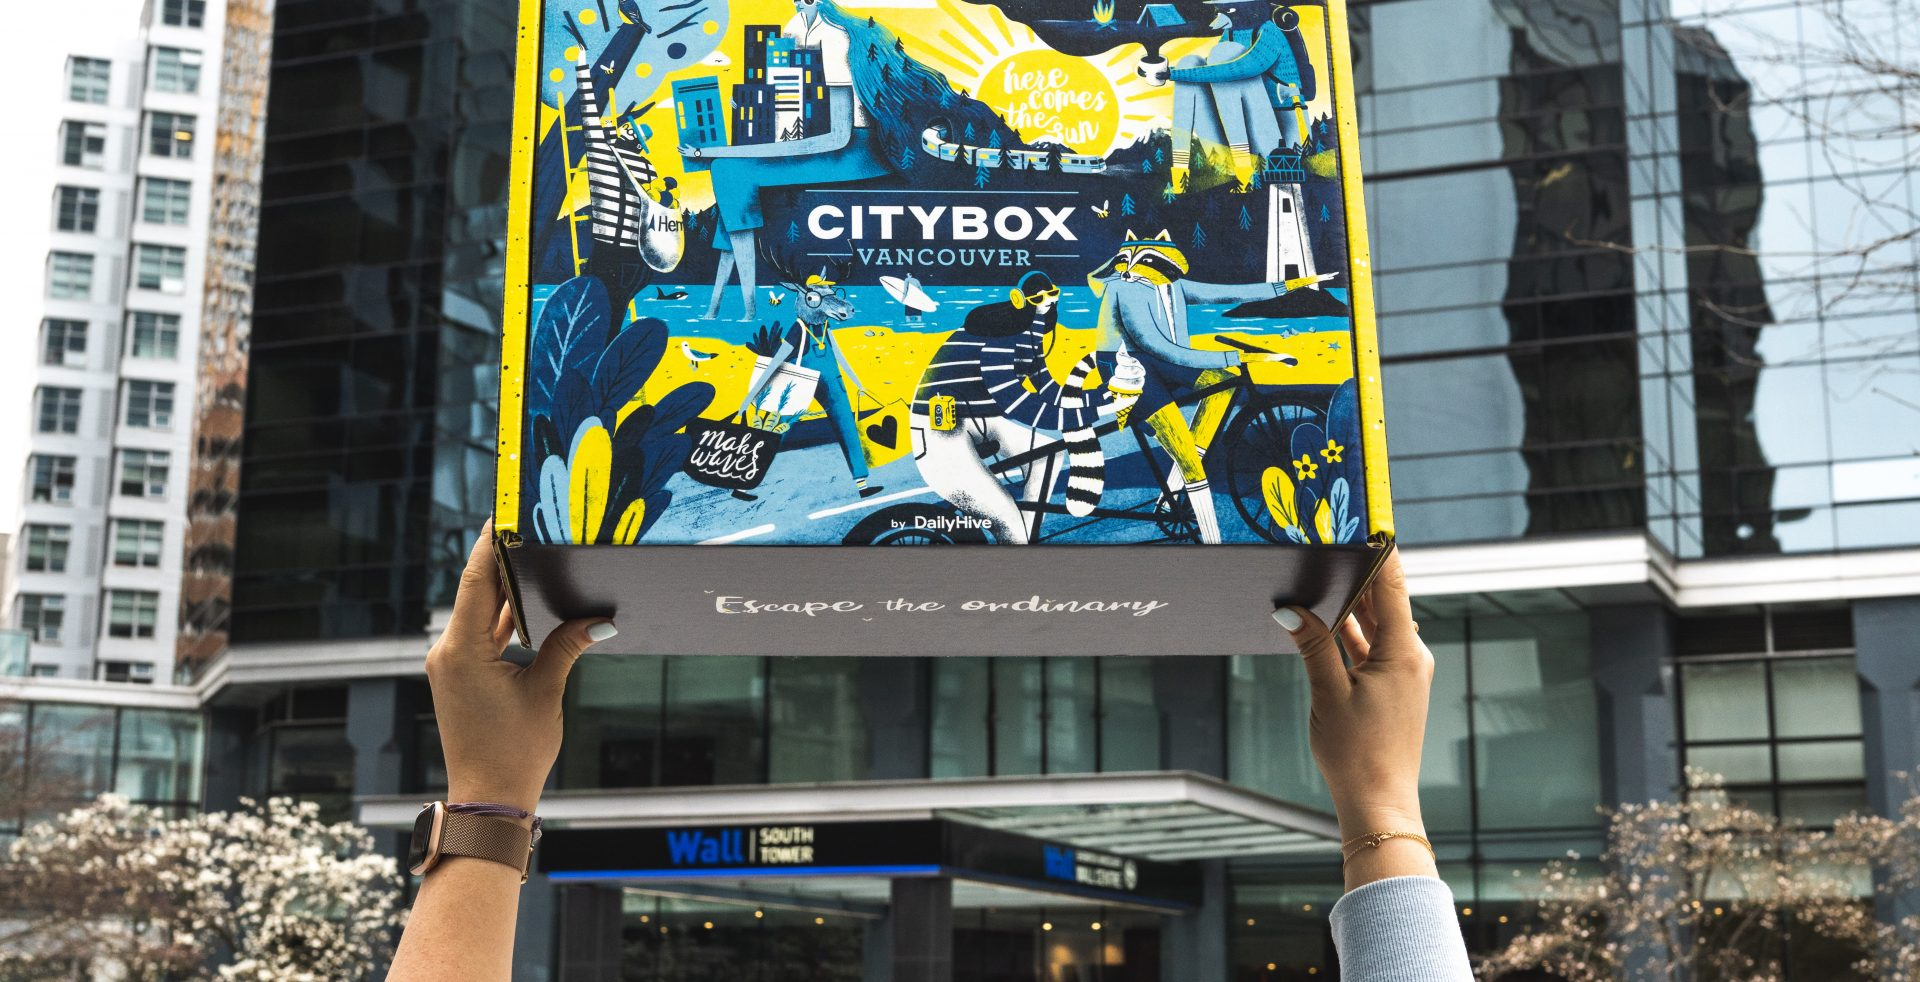 Daily Hive City Box 2.0